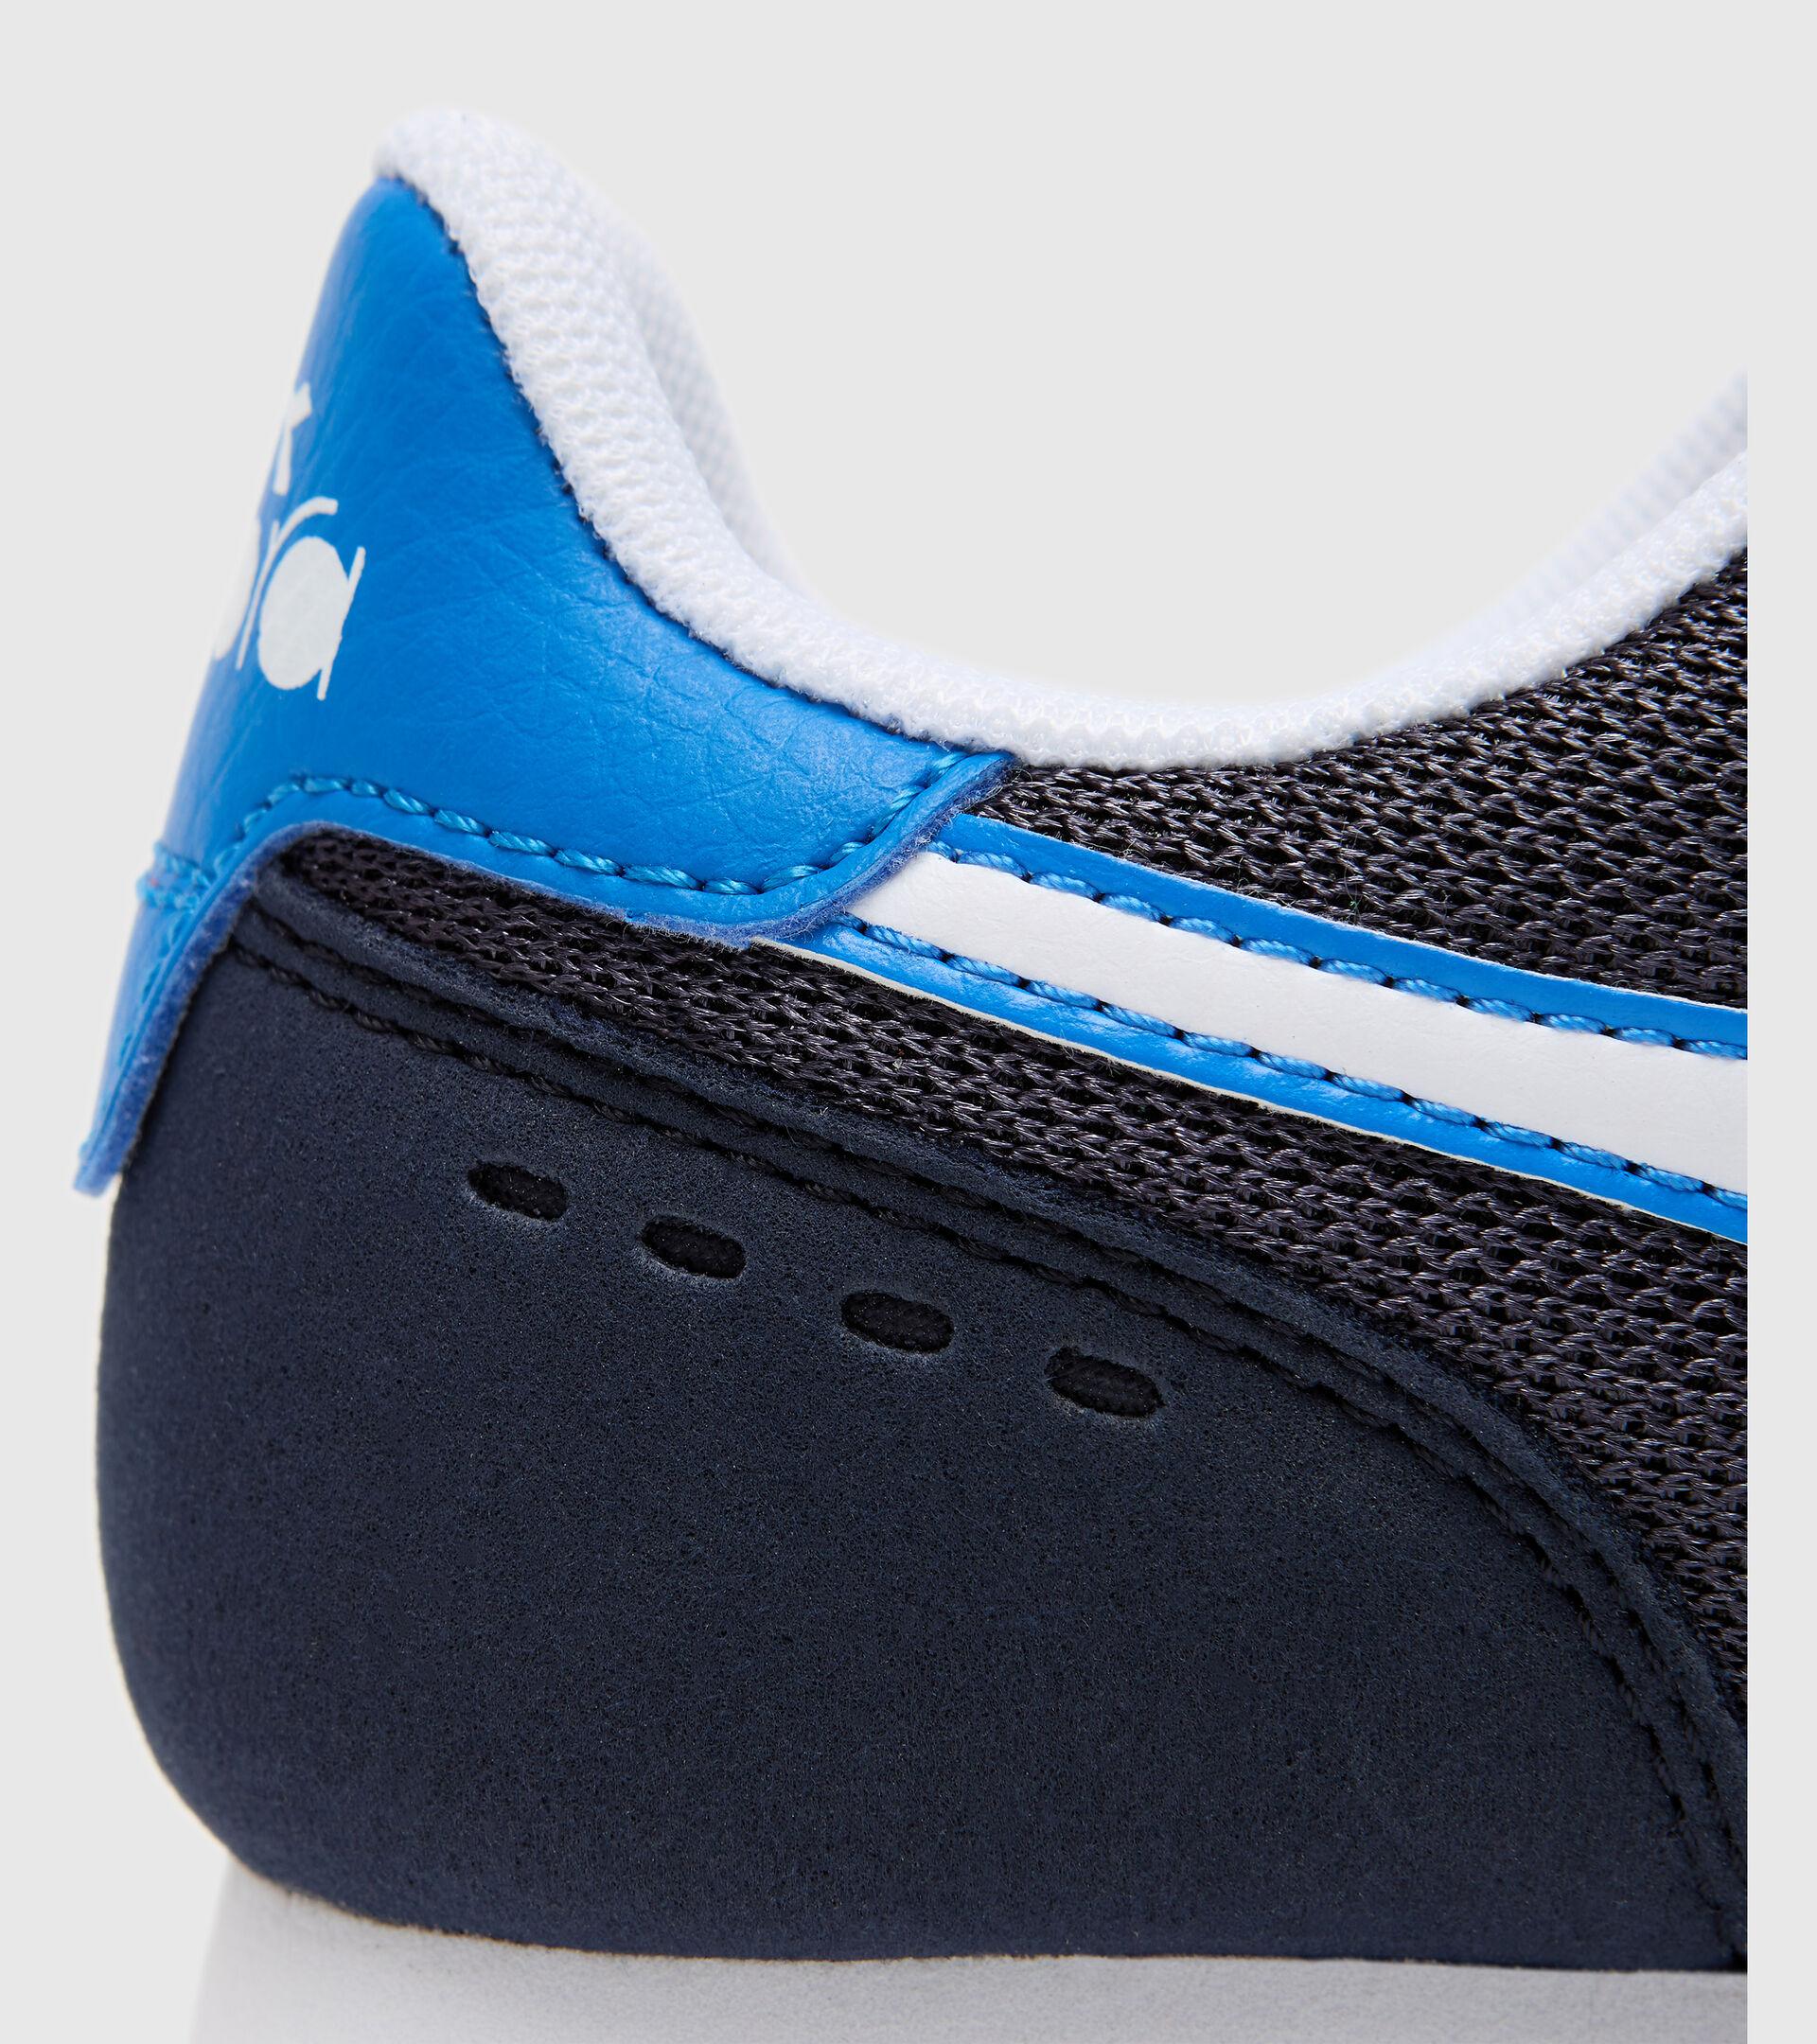 Footwear Sport BAMBINO SIMPLE RUN PS BLUE CORSAIR Diadora